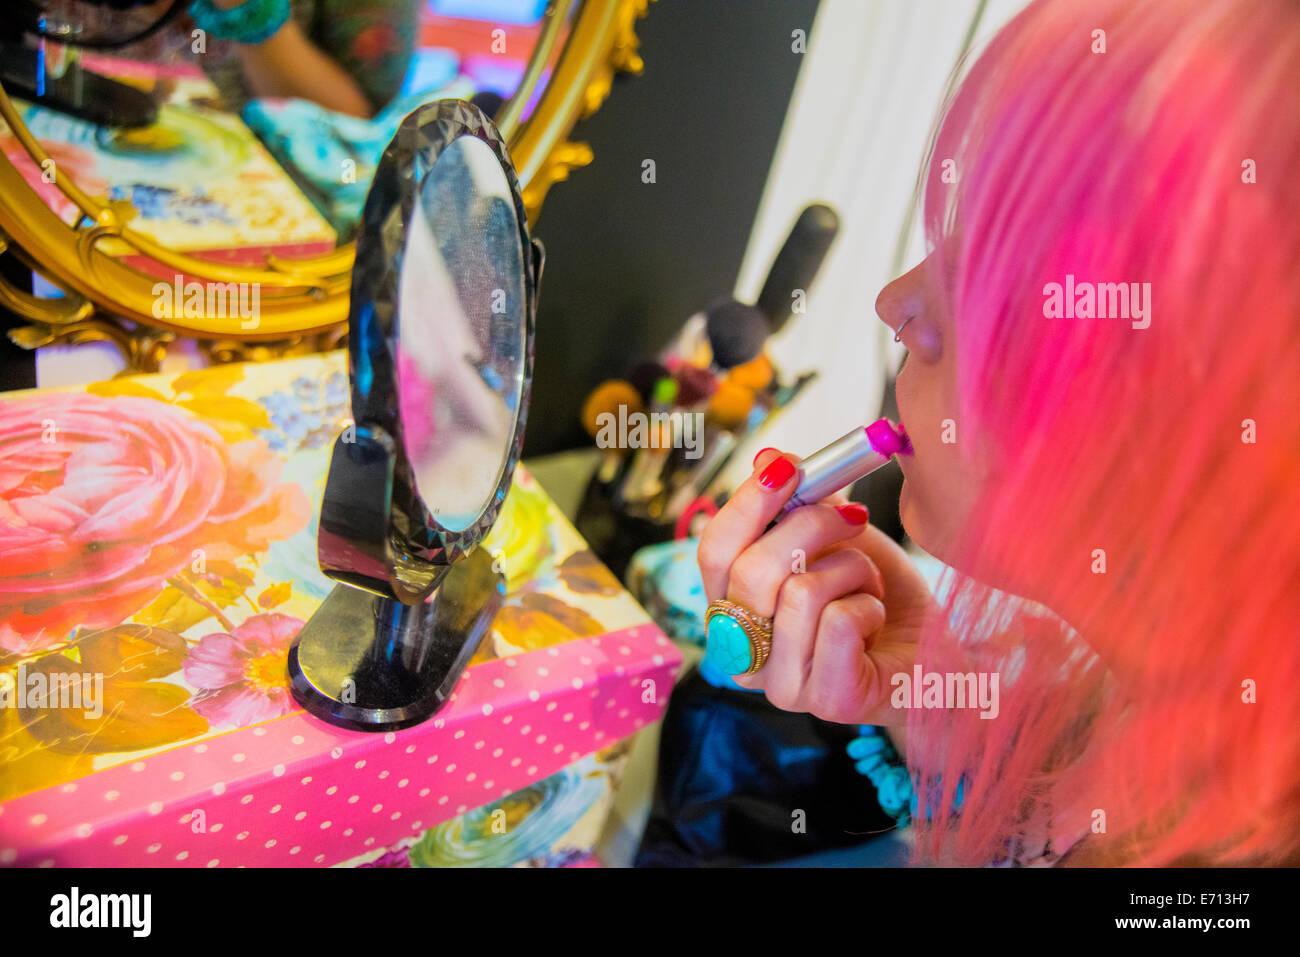 Junge Frau mit rosa Haaren, rosa Lippenstift Stockfoto